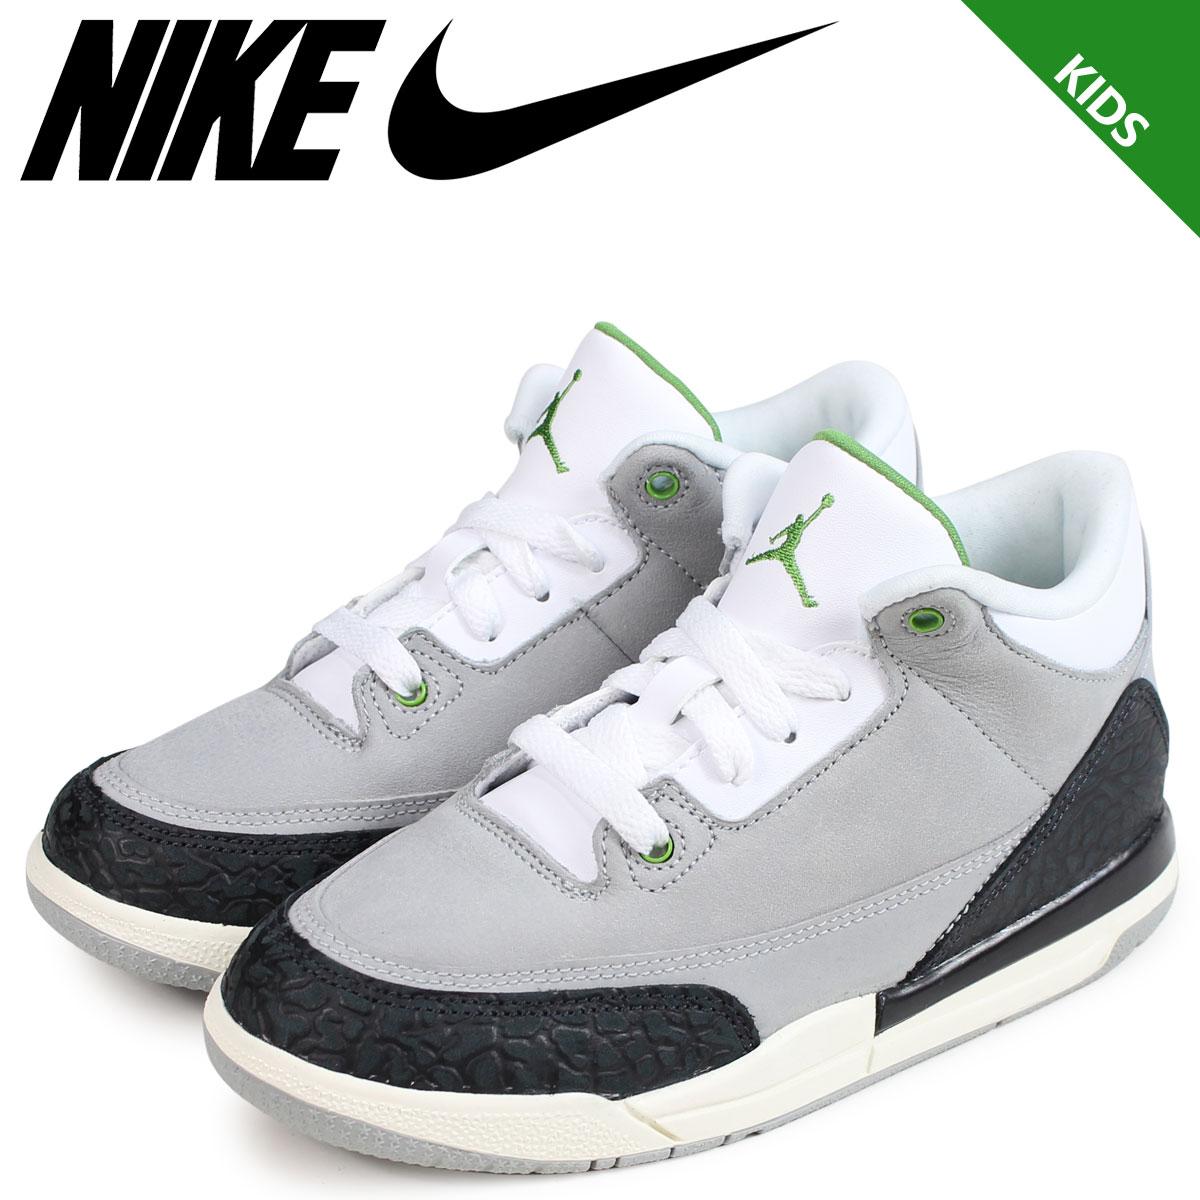 timeless design cacea aec52 Sugar Online Shop: NIKE Nike Air Jordan 3 nostalgic kids sneakers ...